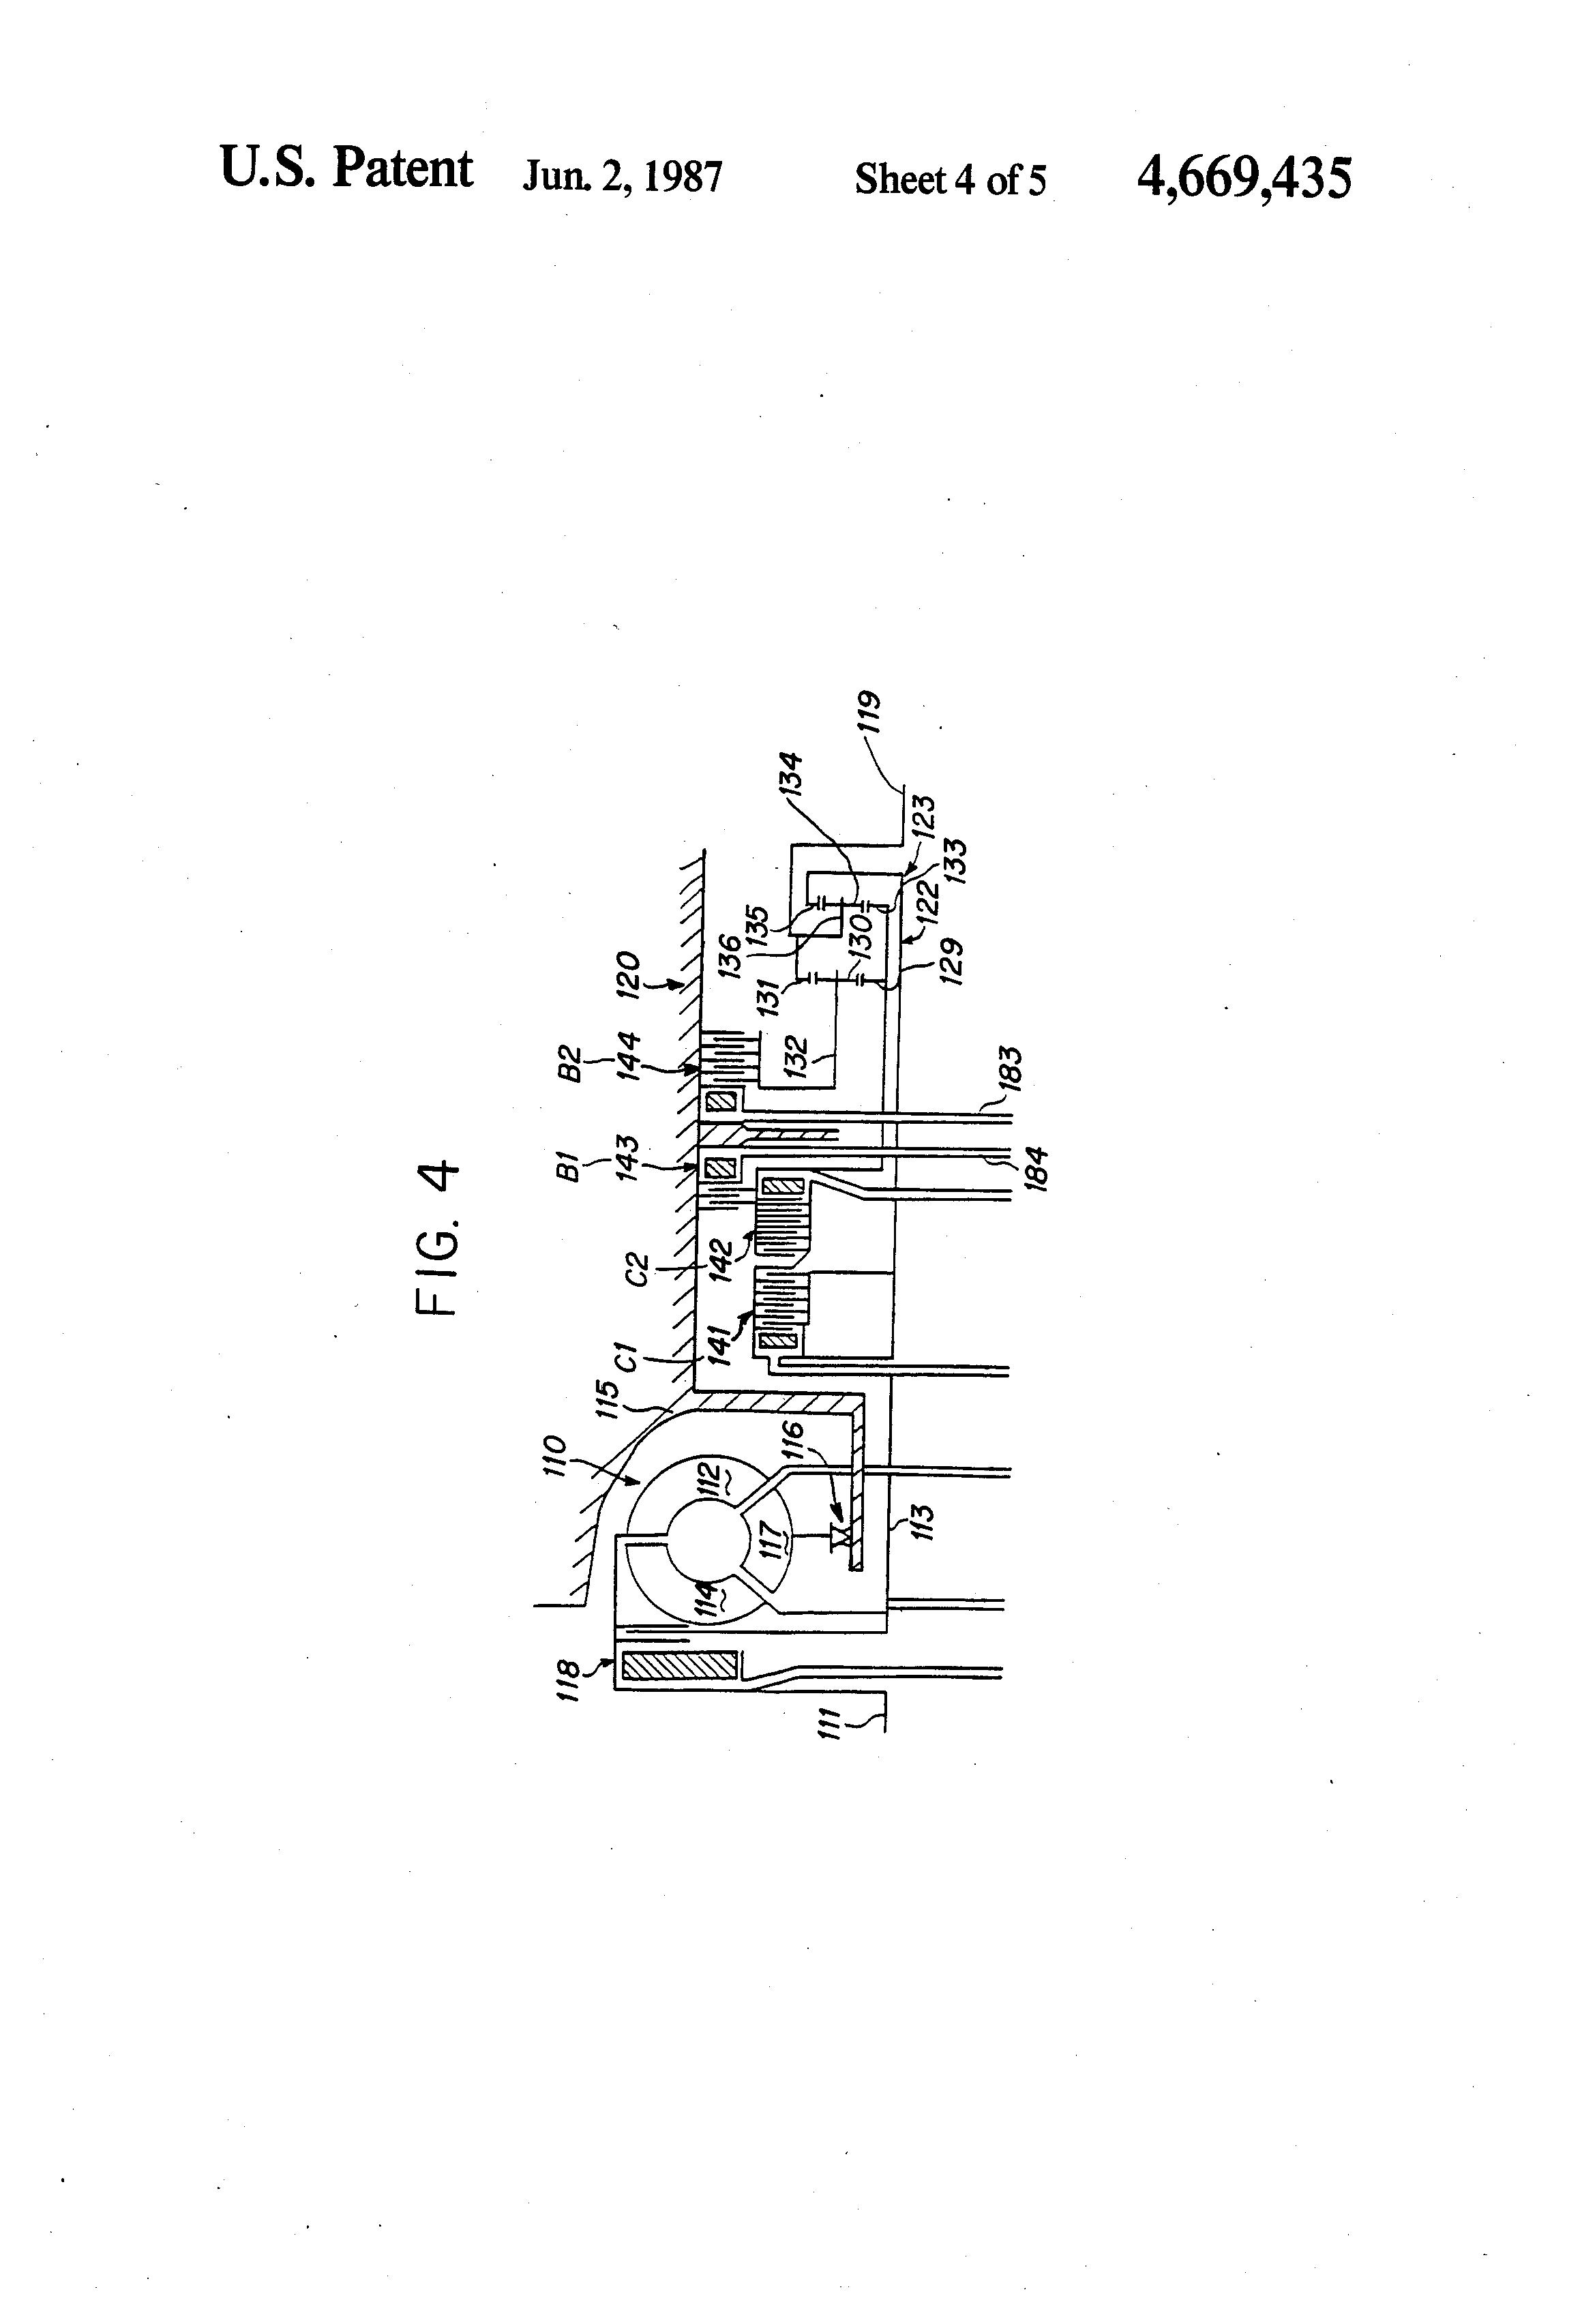 [DIAGRAM] 2000 Mack Ch613 Wiring Diagram FULL Version HD